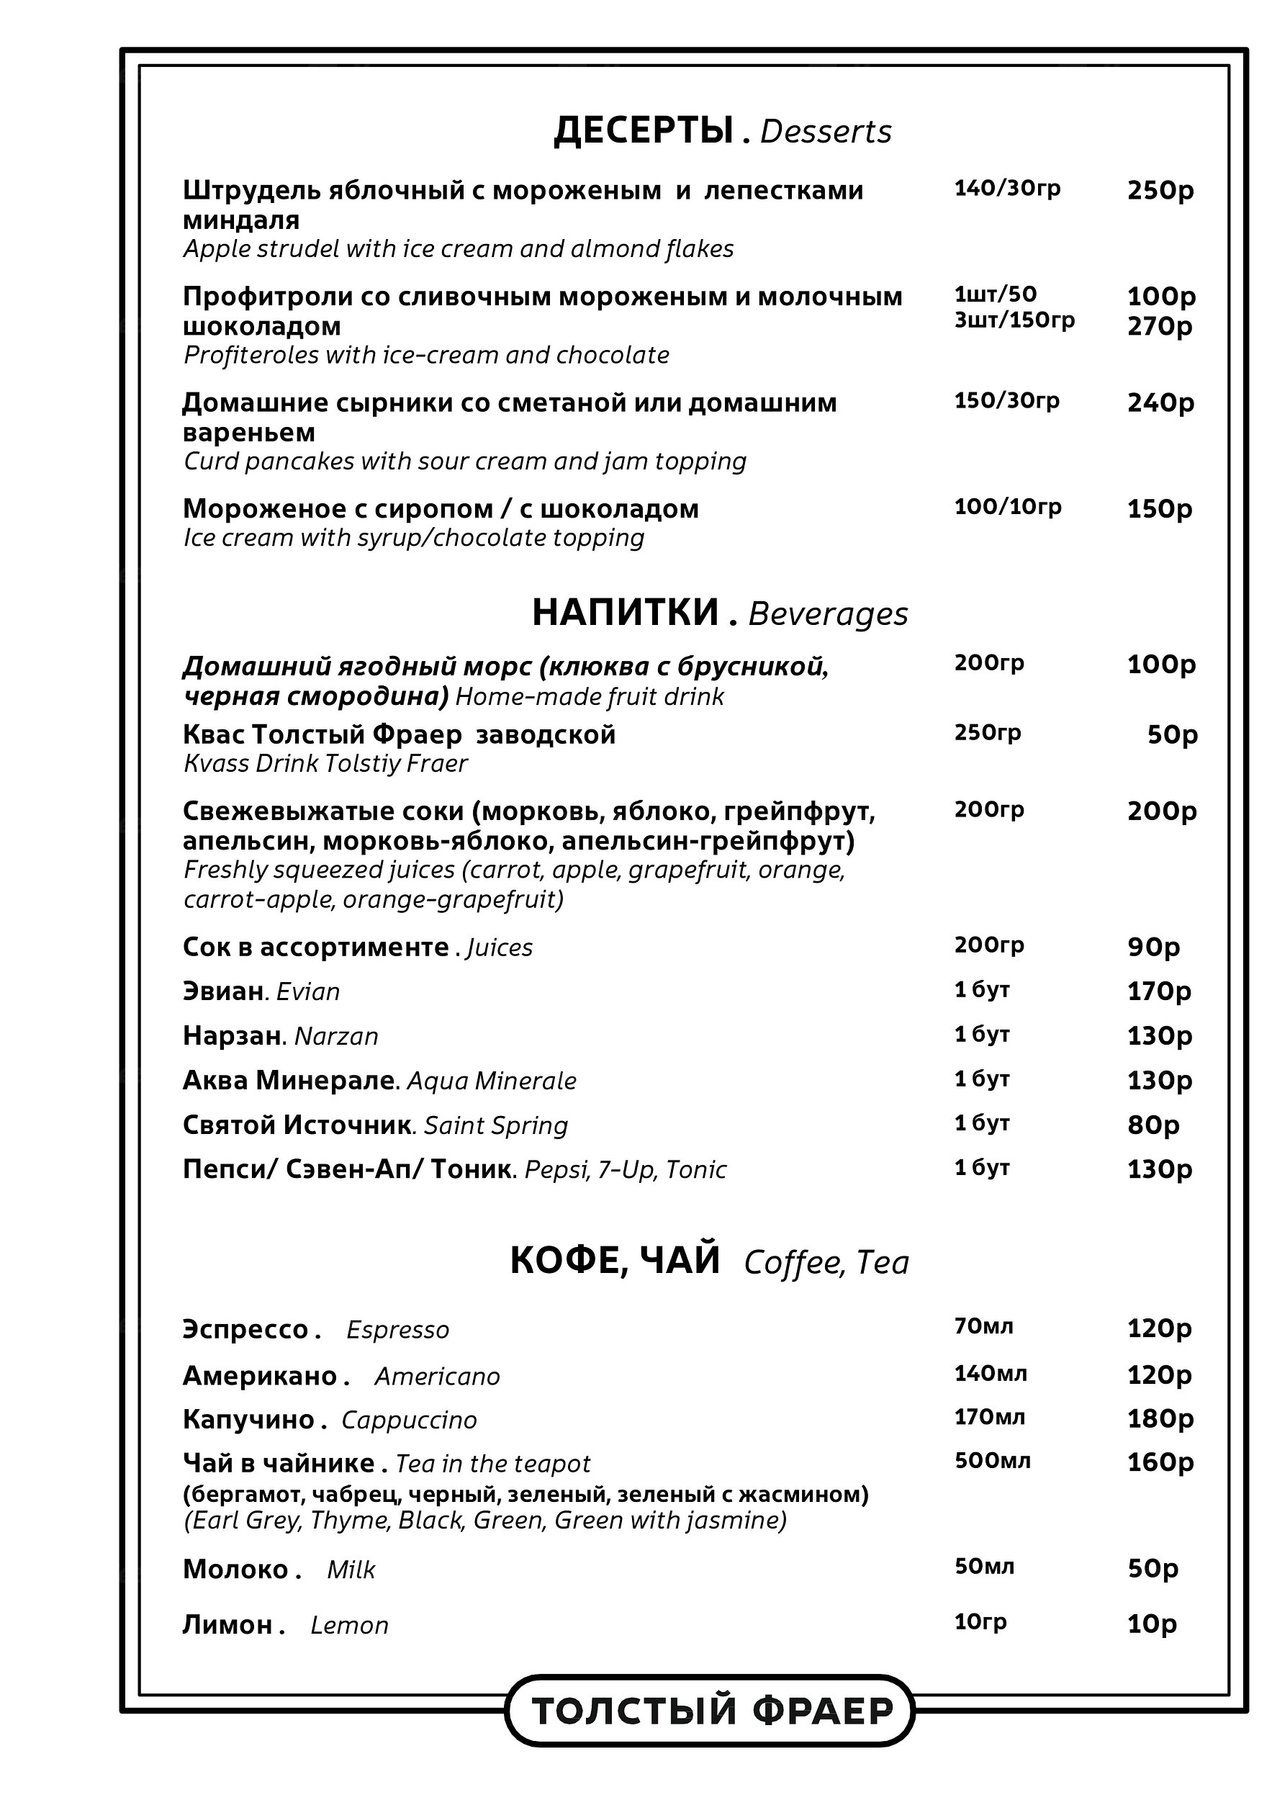 Меню ресторана Толстый Фраер на проспекте Луначарского фото 11